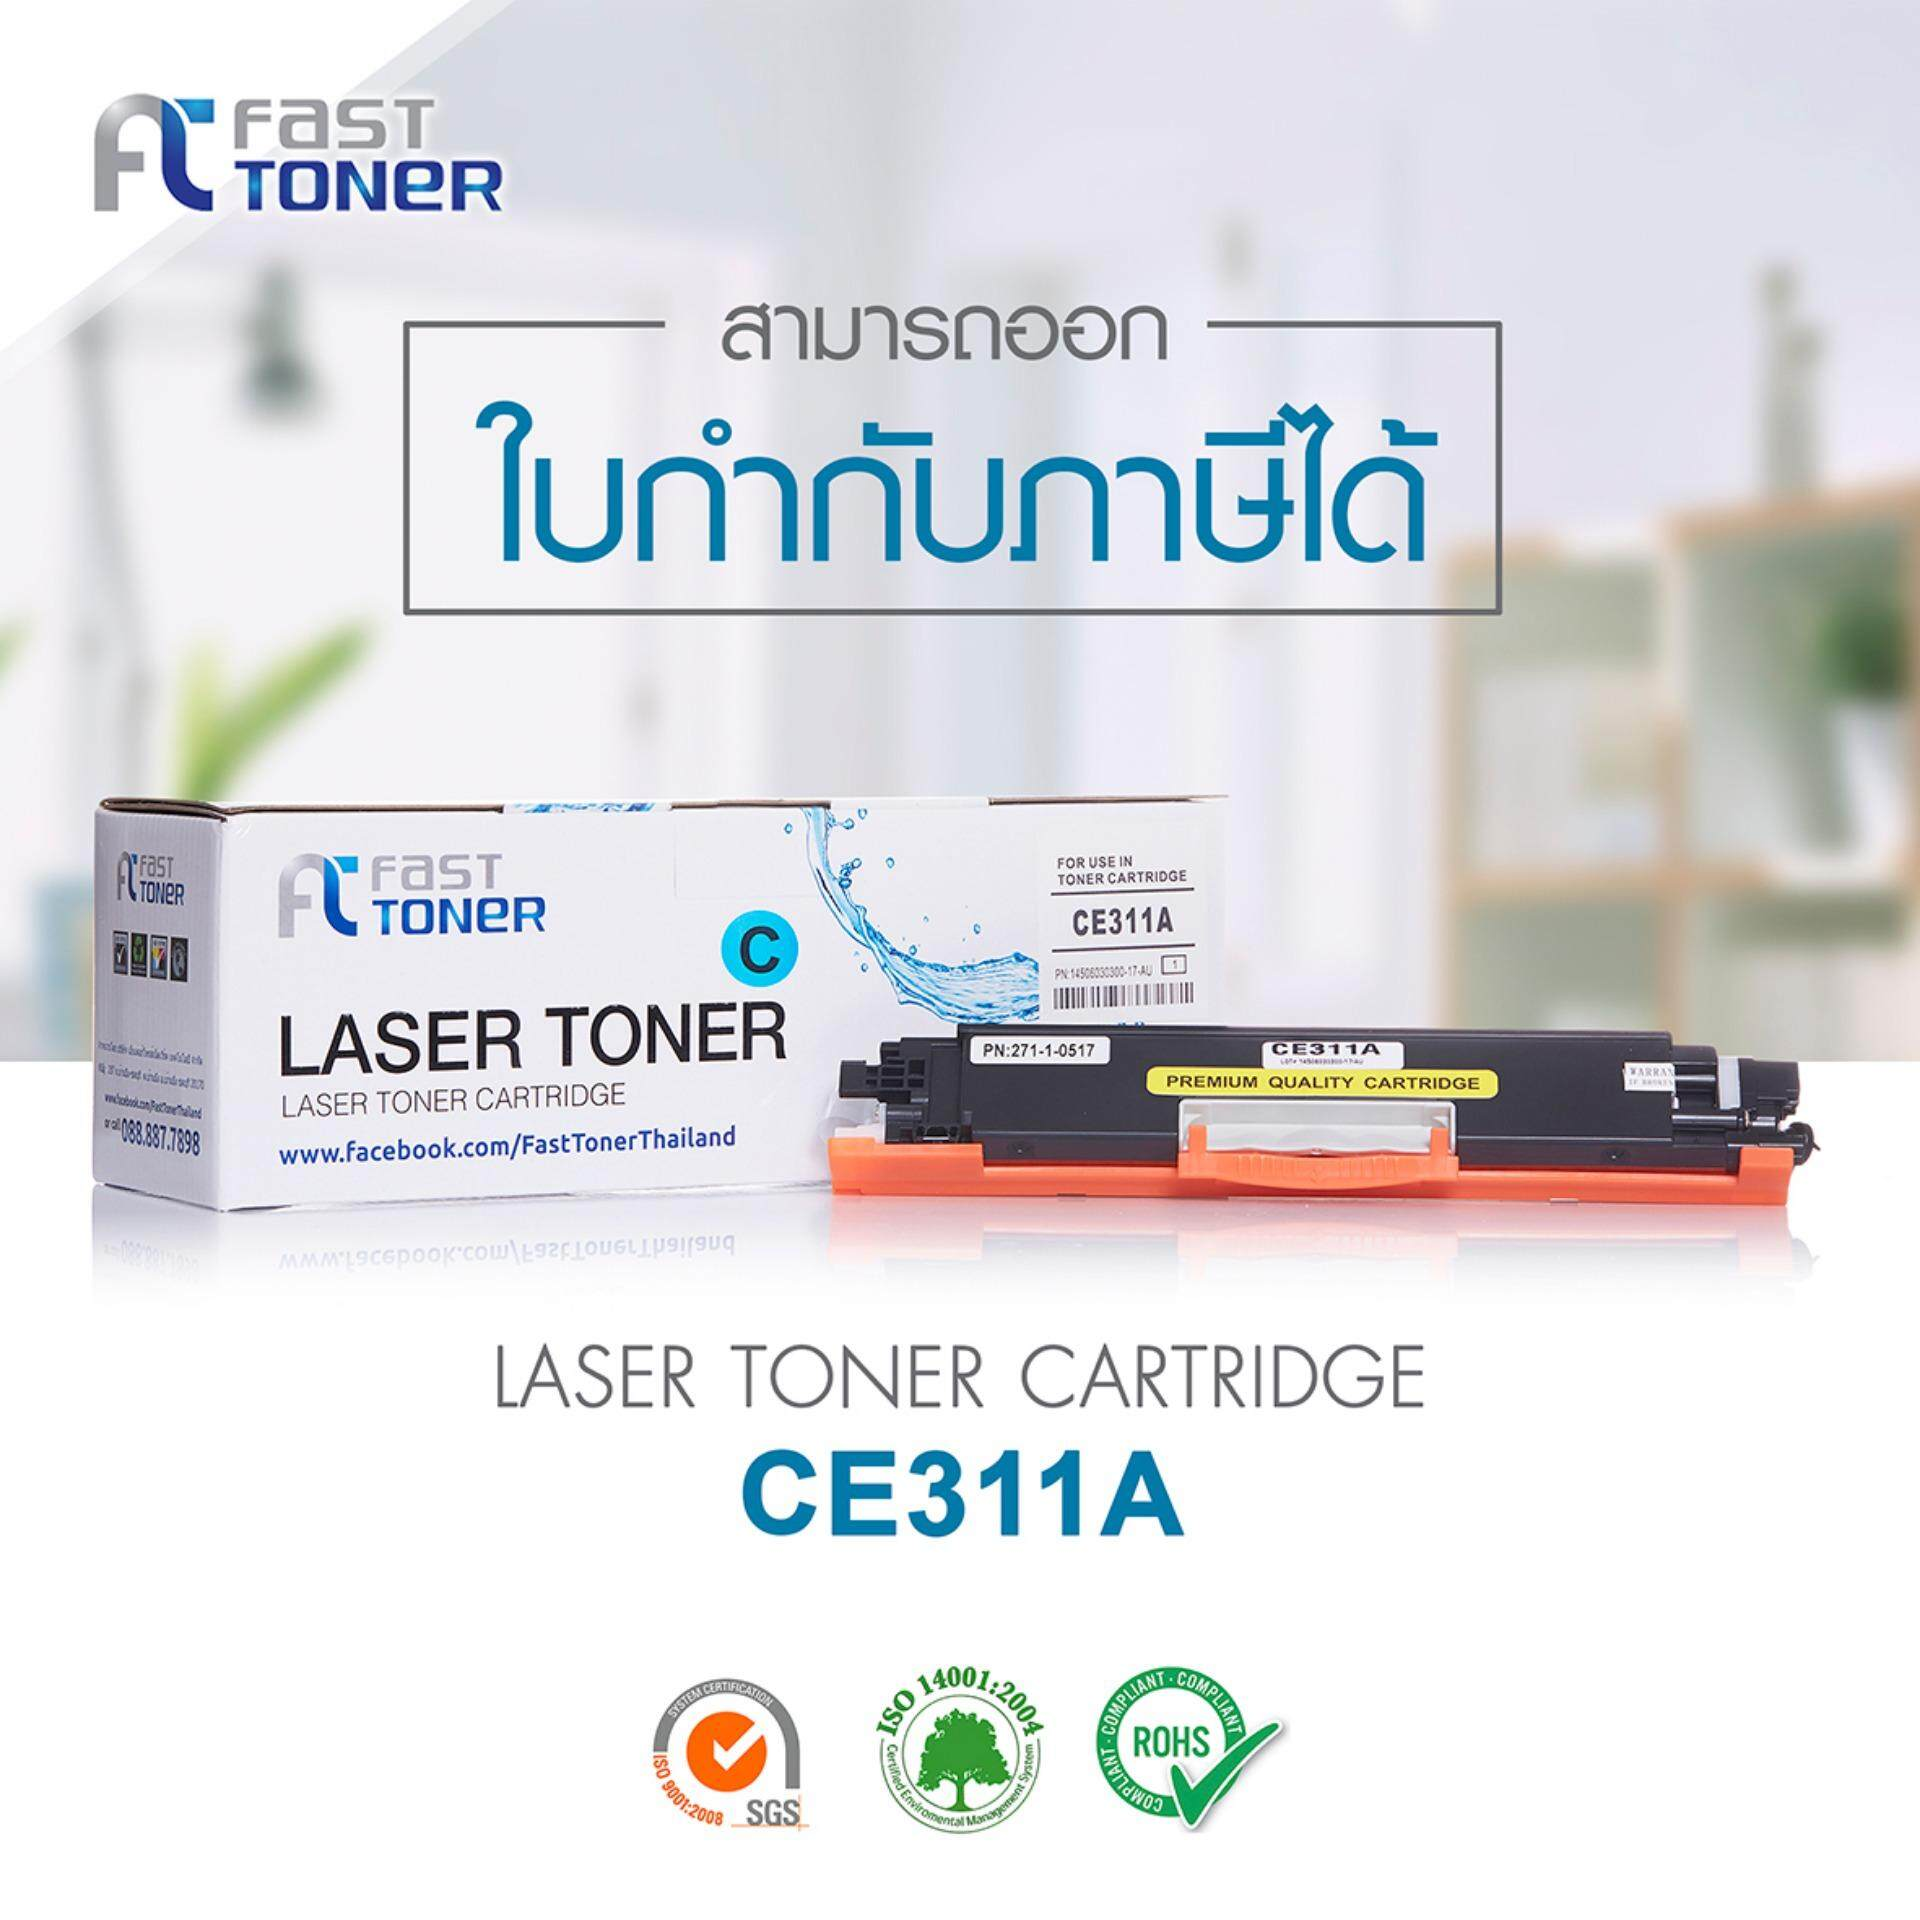 Fast Toner HP ตลับหมึกเทียบเท่า HP 126A รุ่น CE311A (สีฟ้า) สำหรับปริ้นเตอร์ HP LaserJet Printer CP1025/Cp1025NW/M175nw